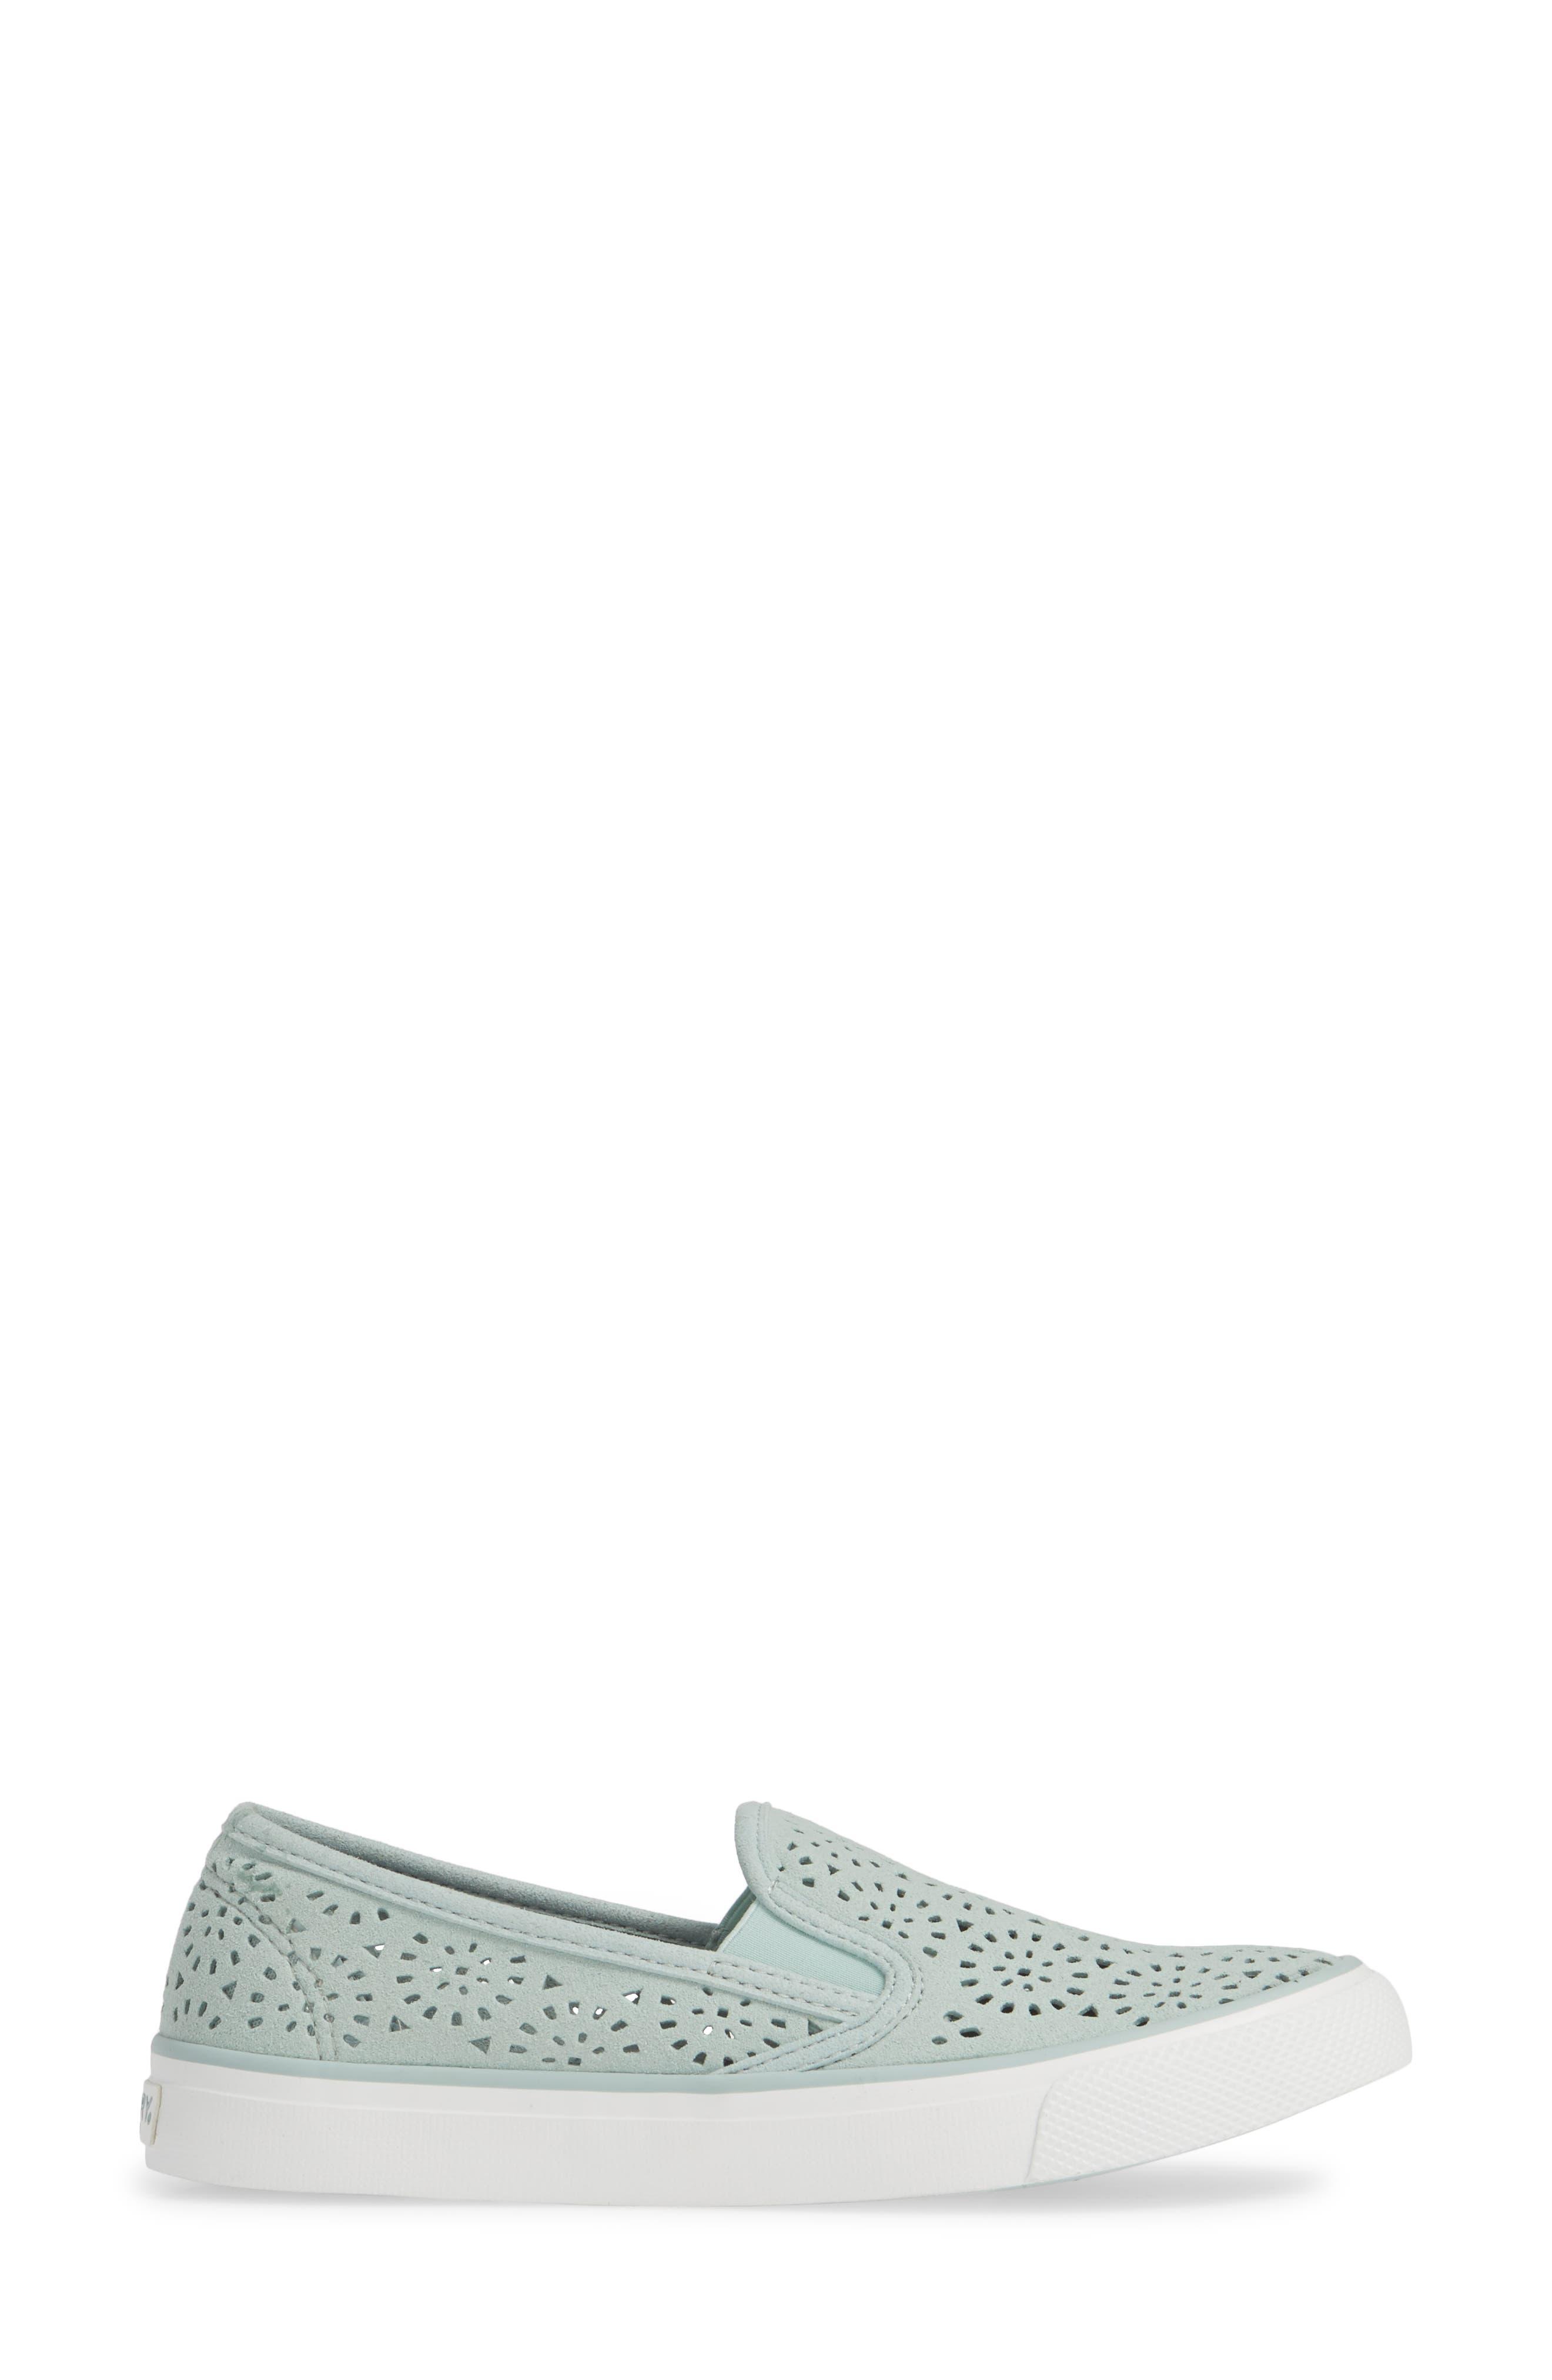 Seaside Nautical Perforated Slip-On Sneaker,                             Alternate thumbnail 3, color,                             MINT NUBUCK LEATHER